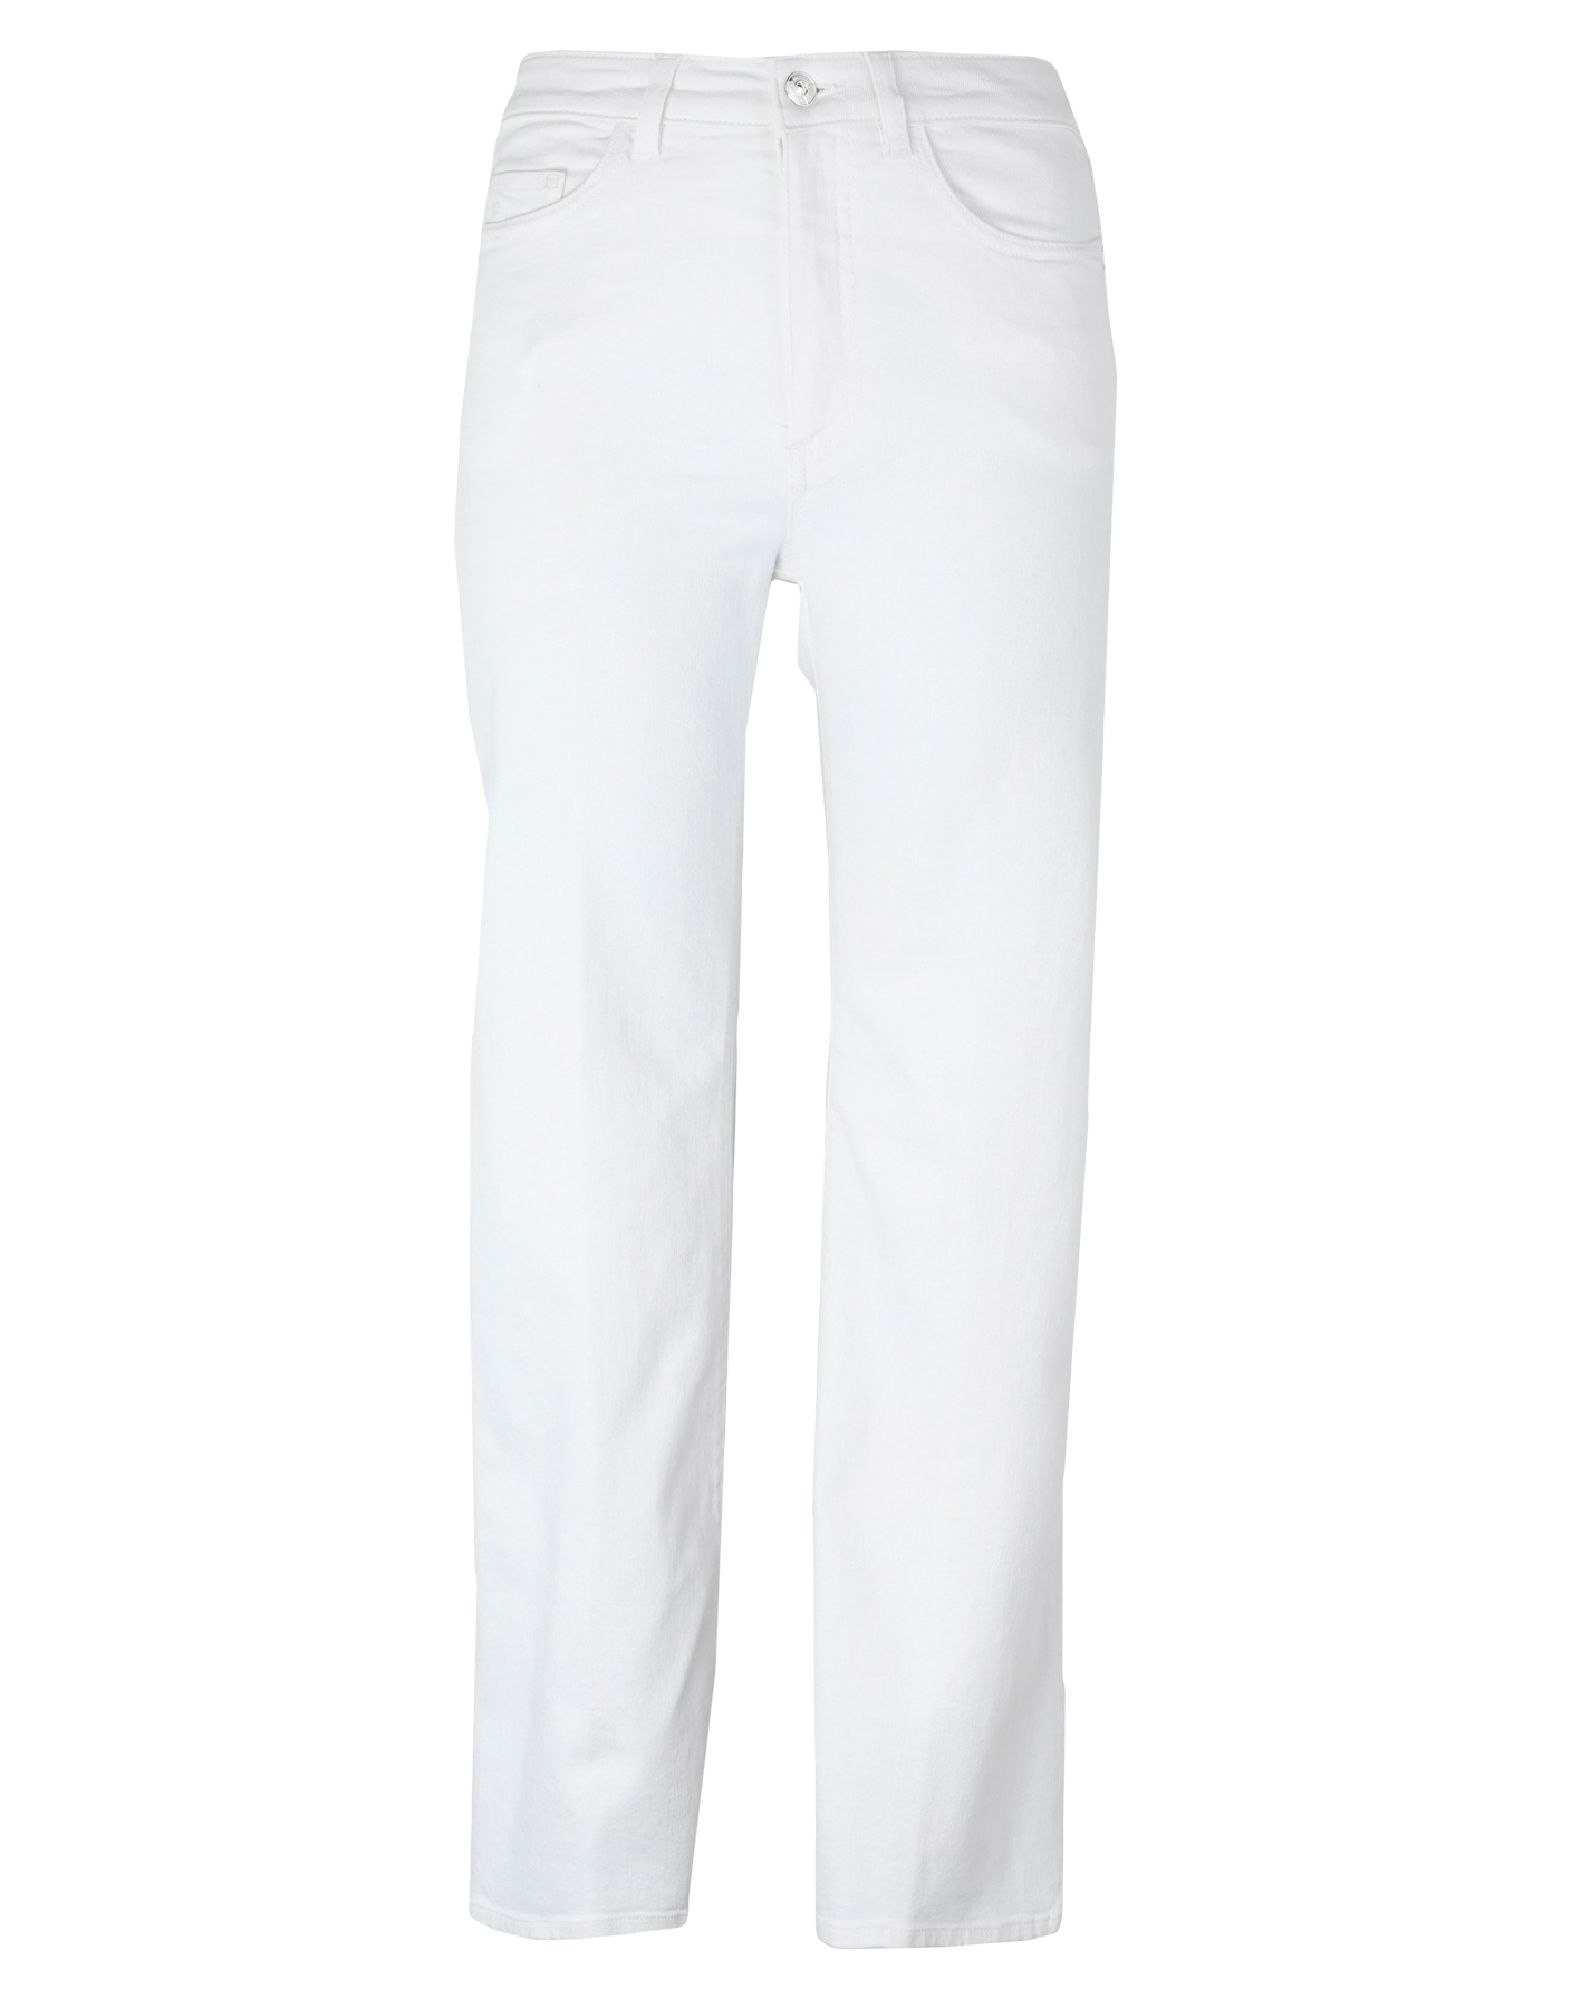 NINE: INTHE: MORNING Denim pants - Item 42770236